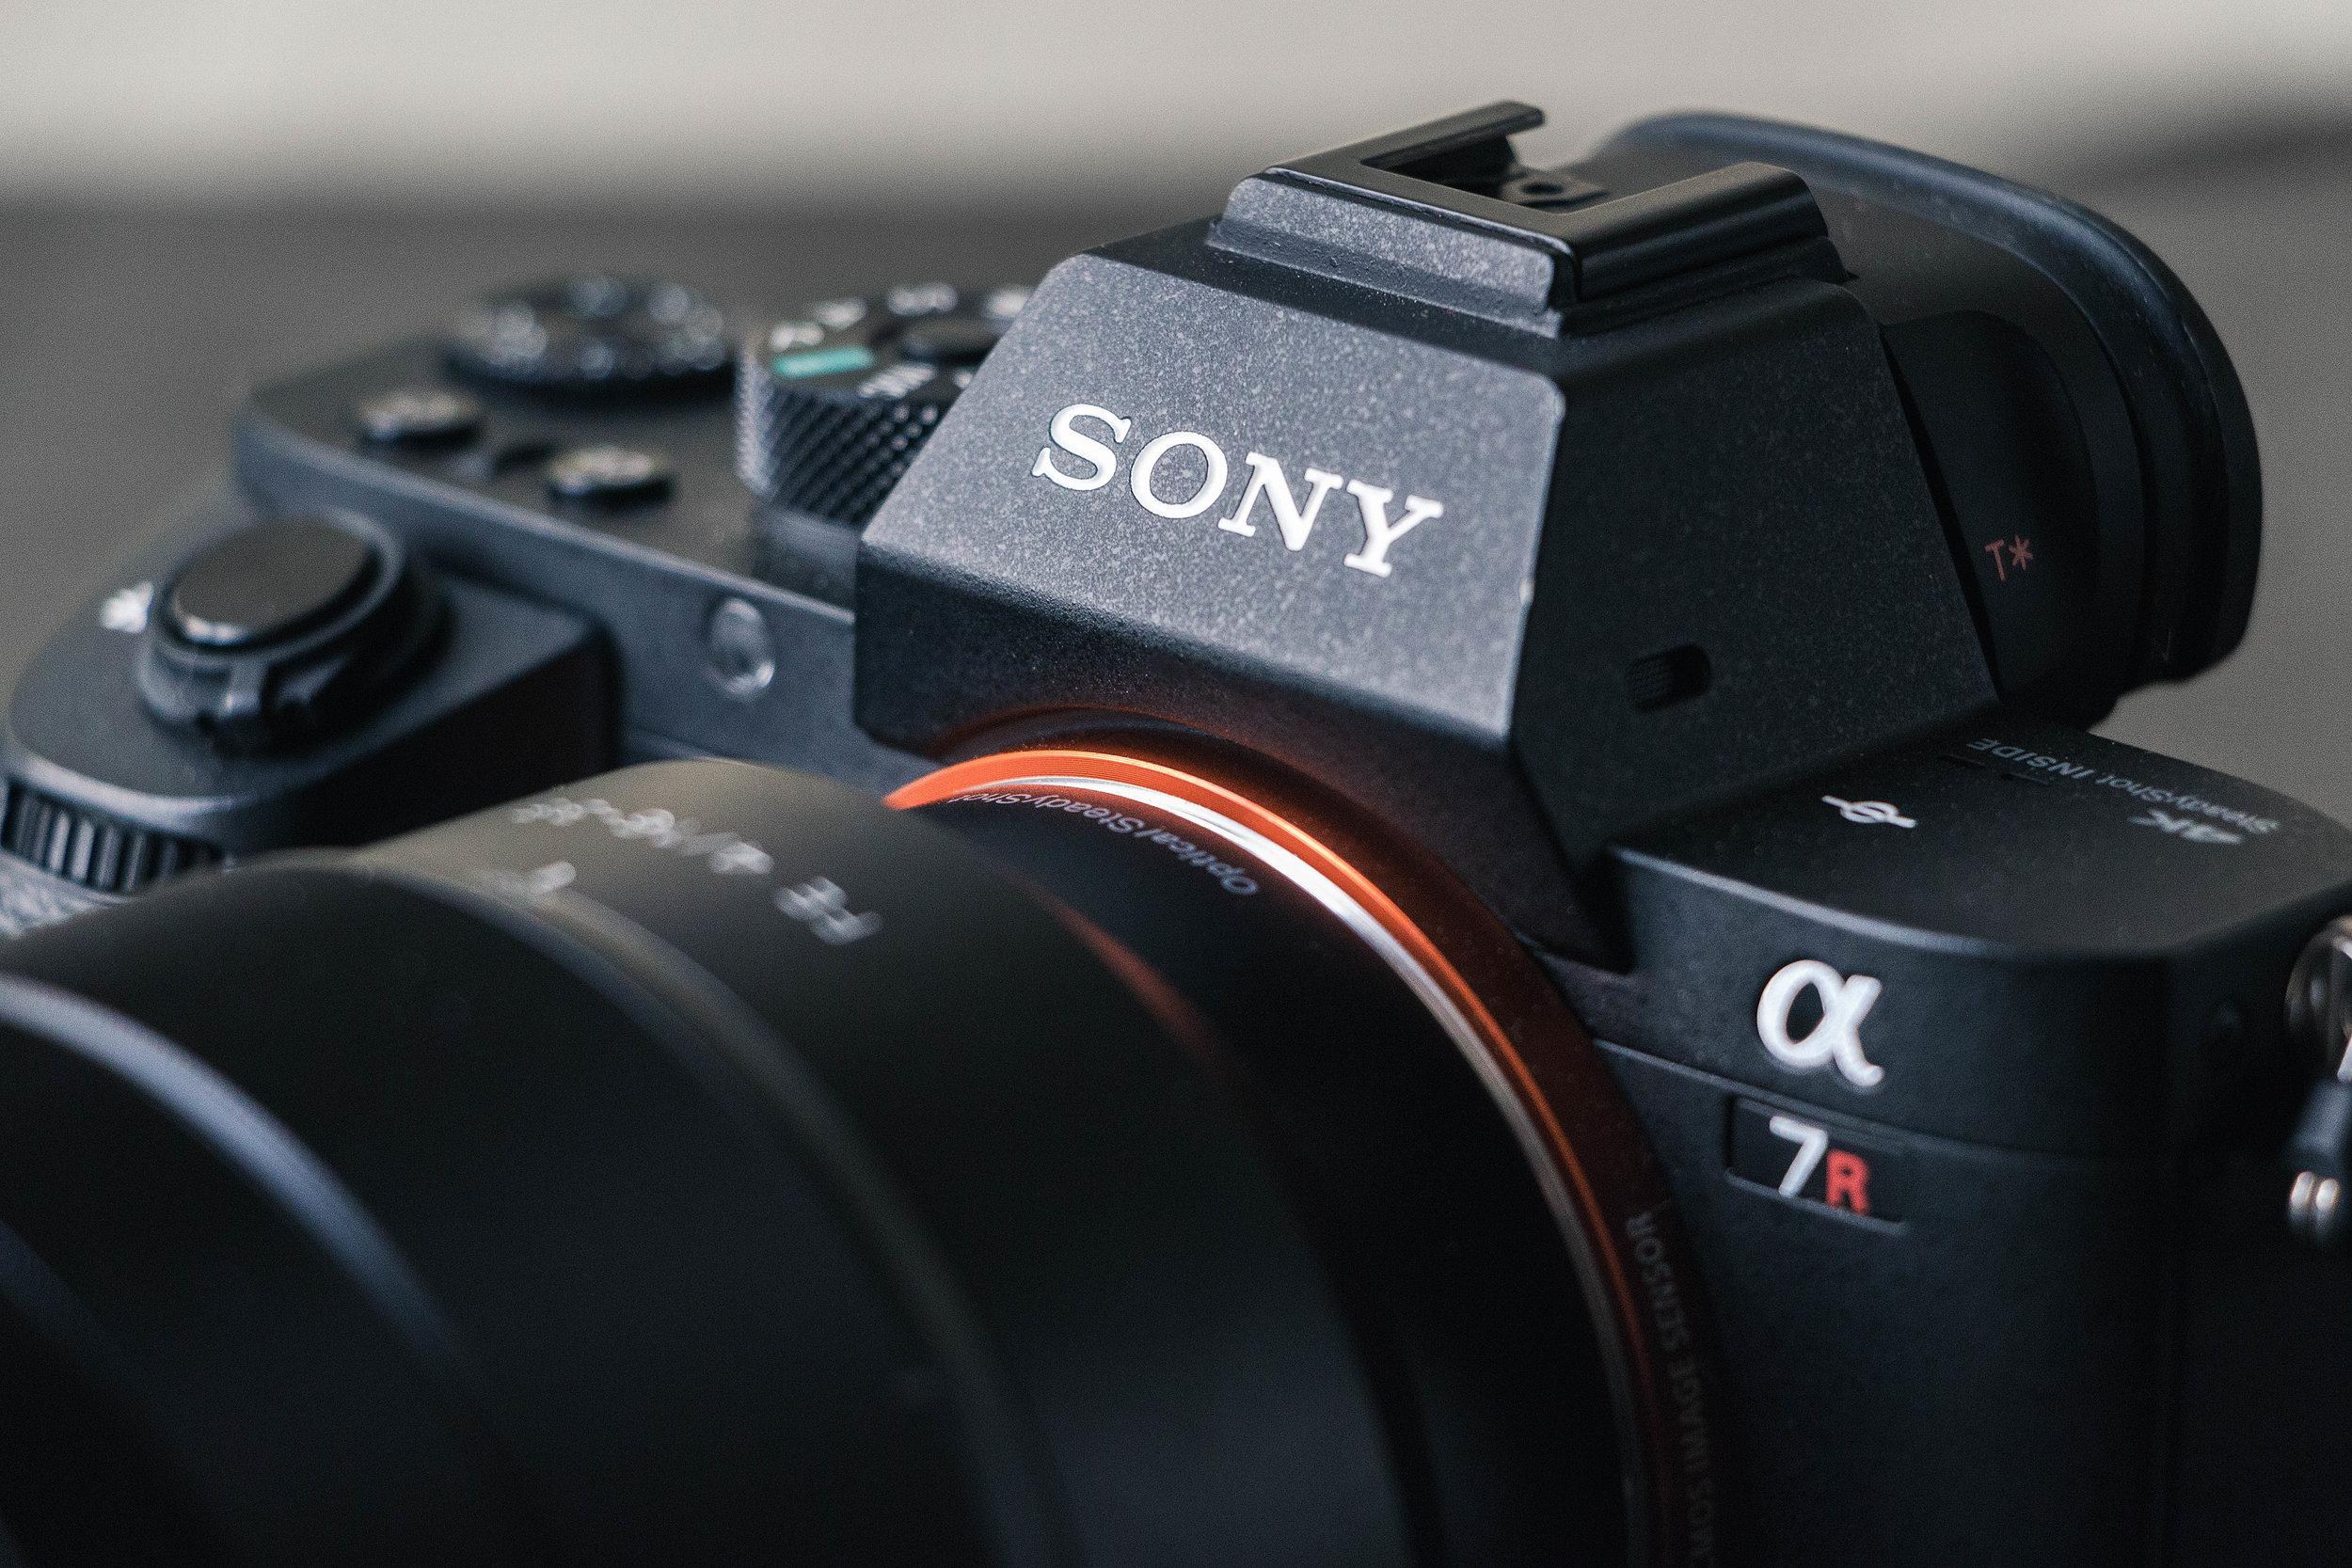 Sony A7RII Appareil photo mirrorless